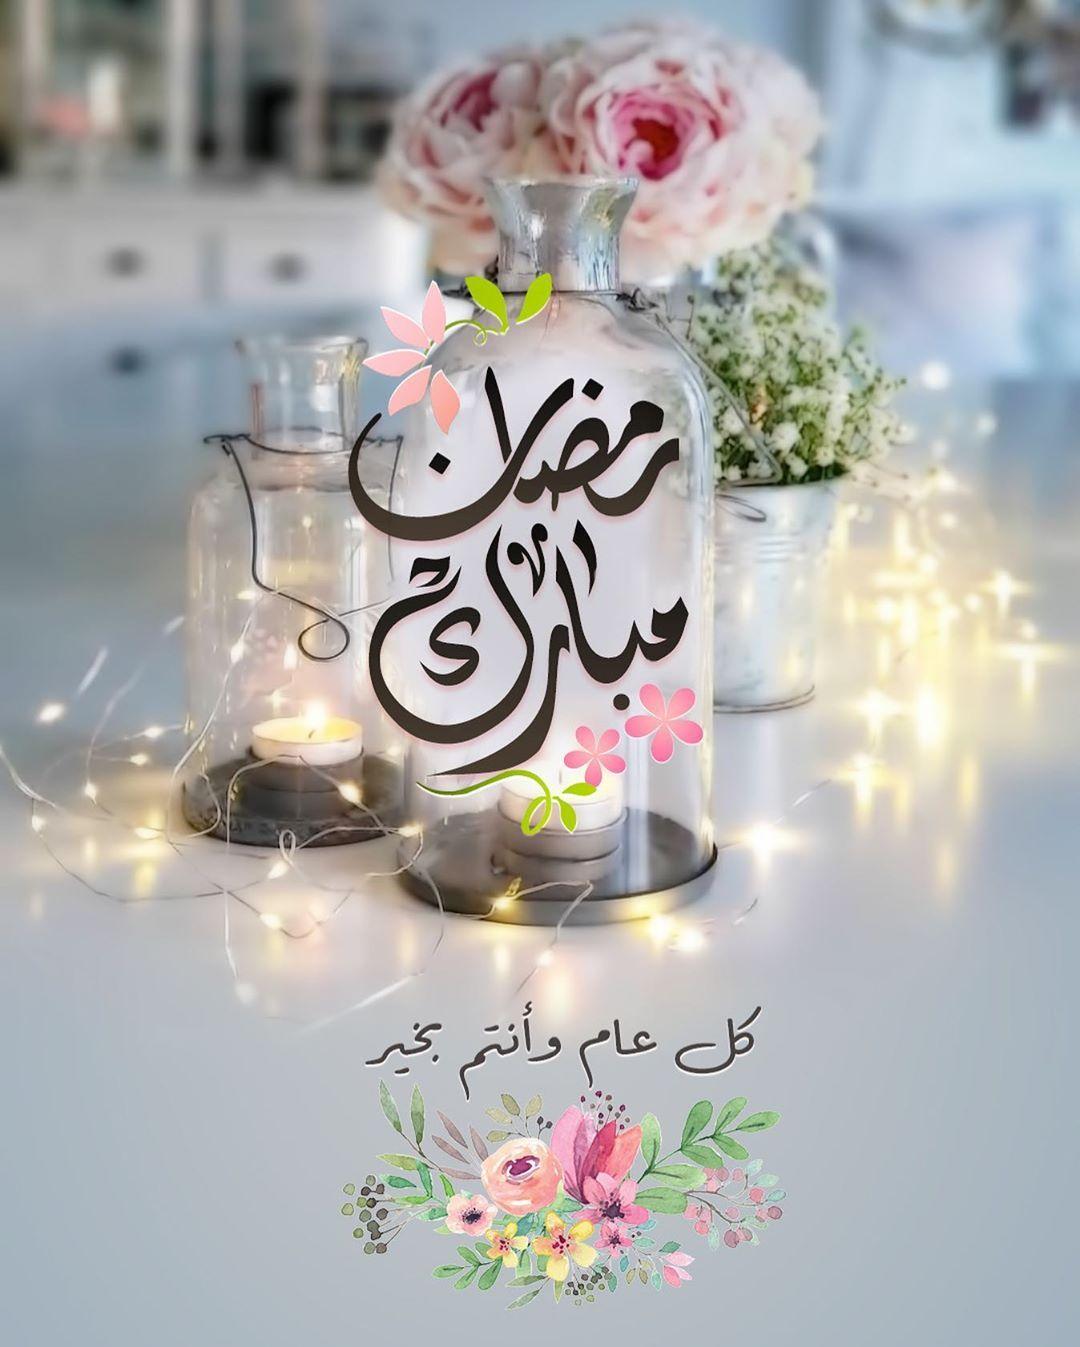 P E A R L A On Instagram رمضان تهنئة رمضان رمضان يجمعنا مبارك عليكم الشهر رمزيات رمضانيات Ramadan Gifts Ramadan Lantern Love Wallpaper Download